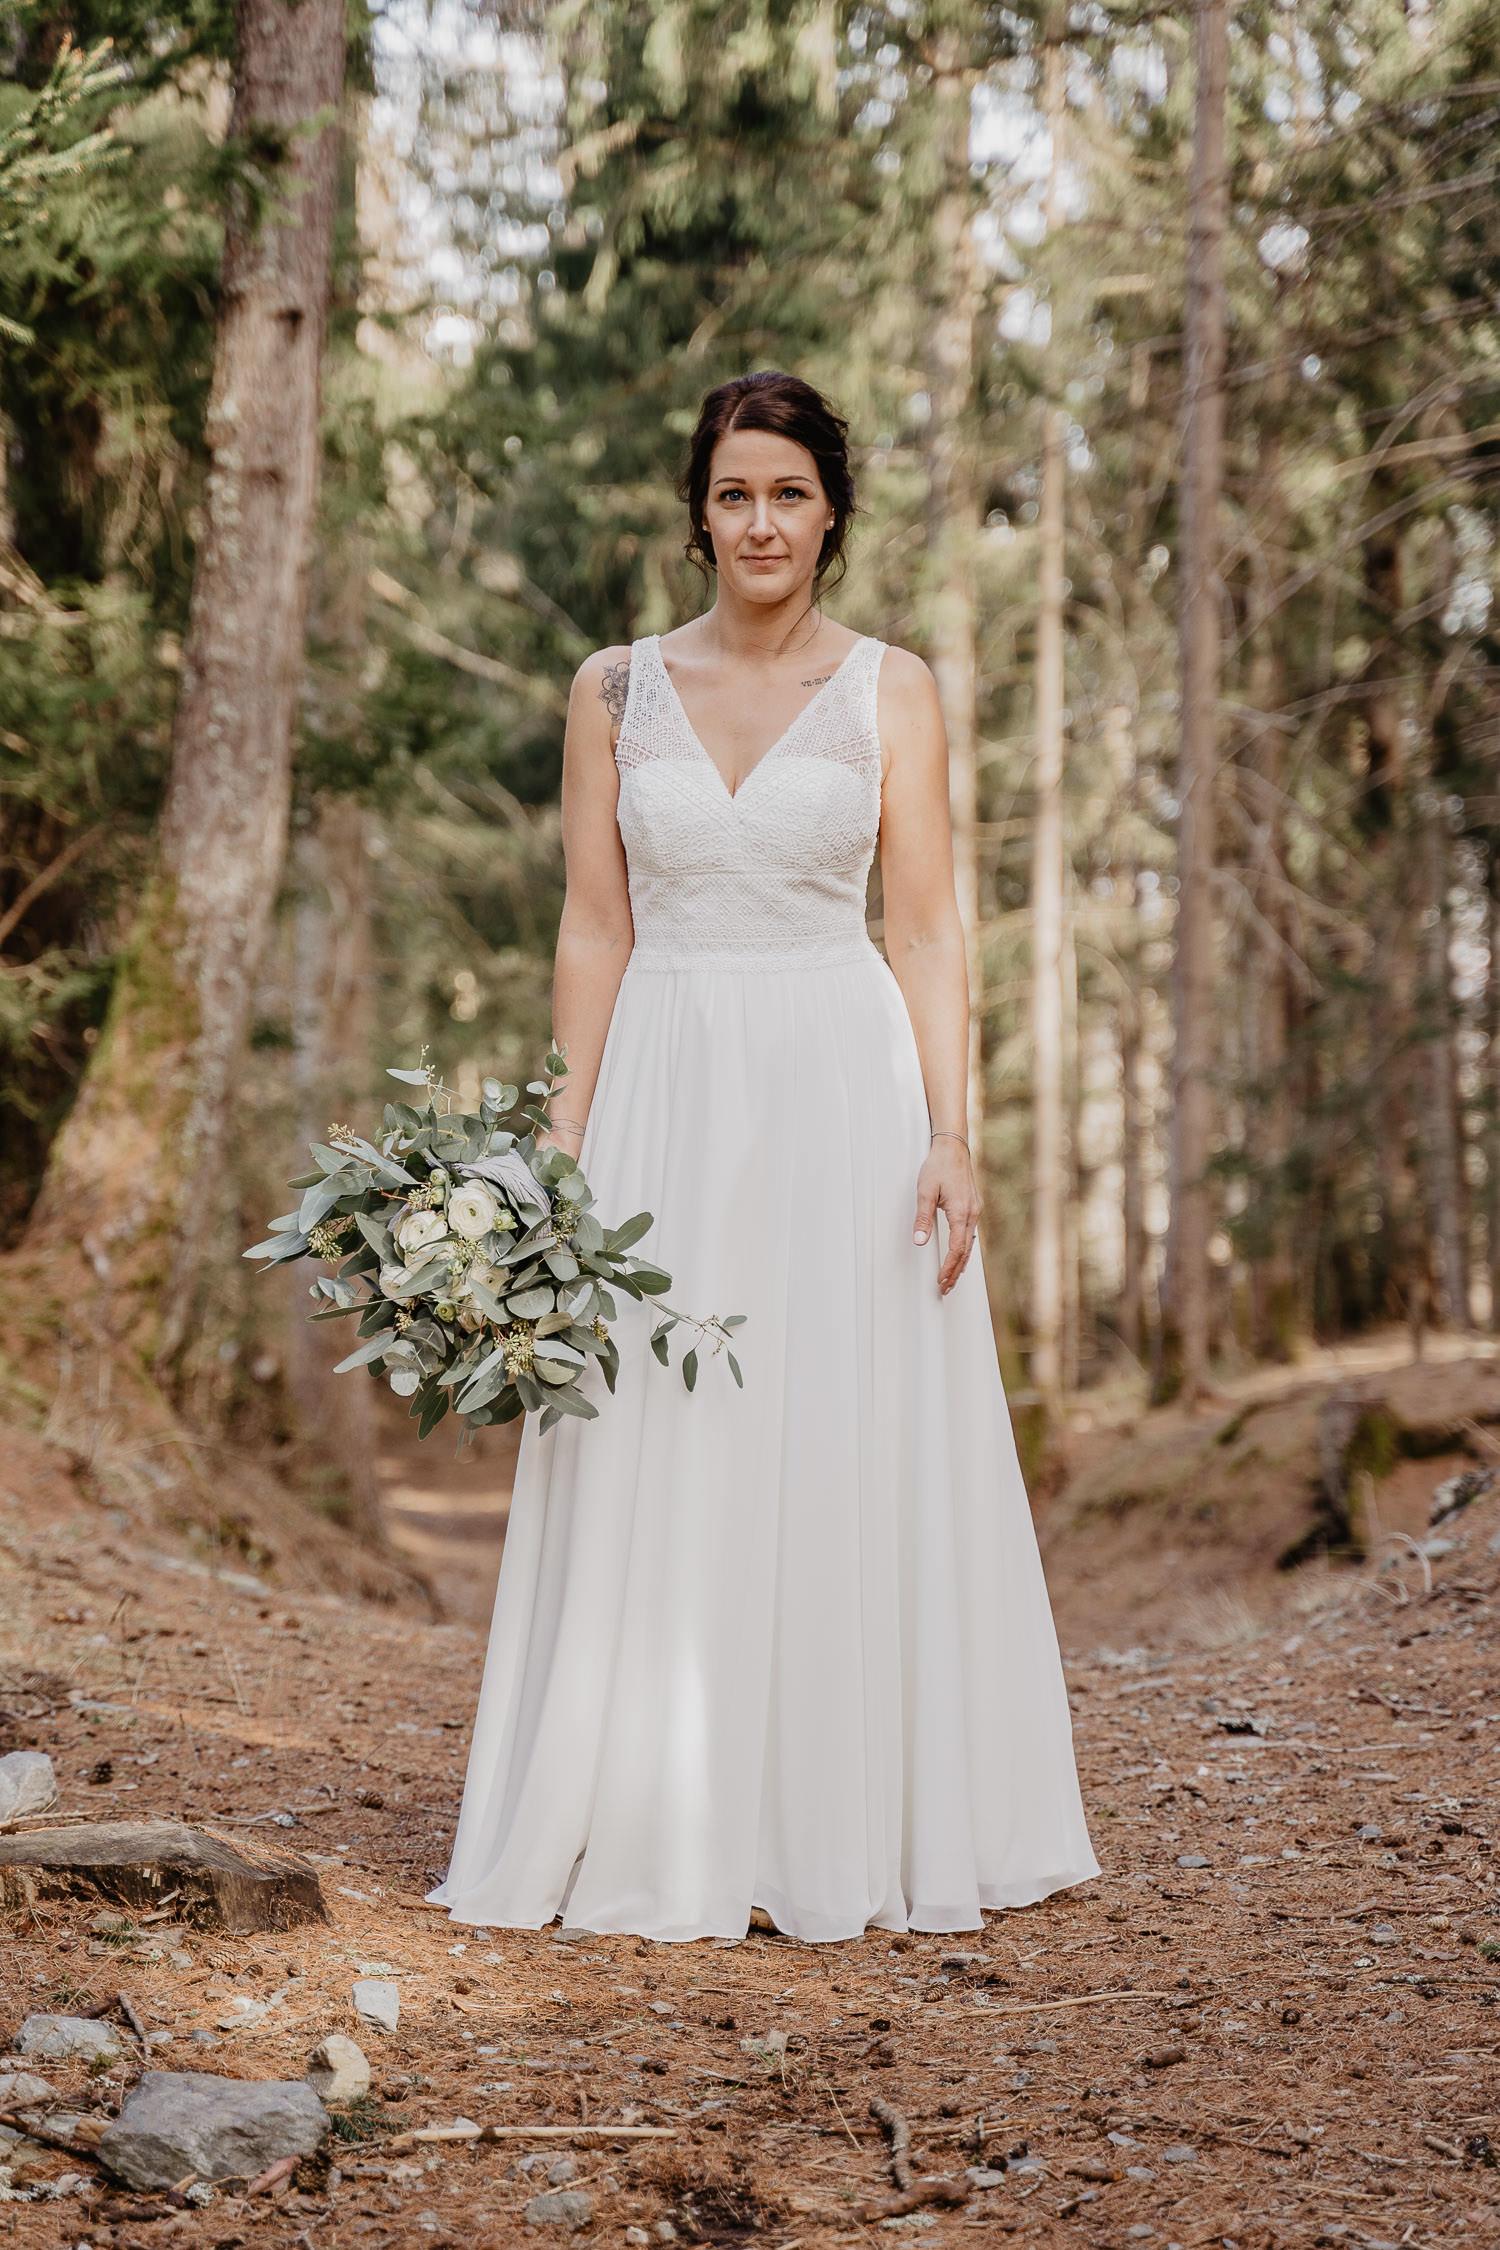 Hochzeitsfotograf Axams Patscherkofel 17